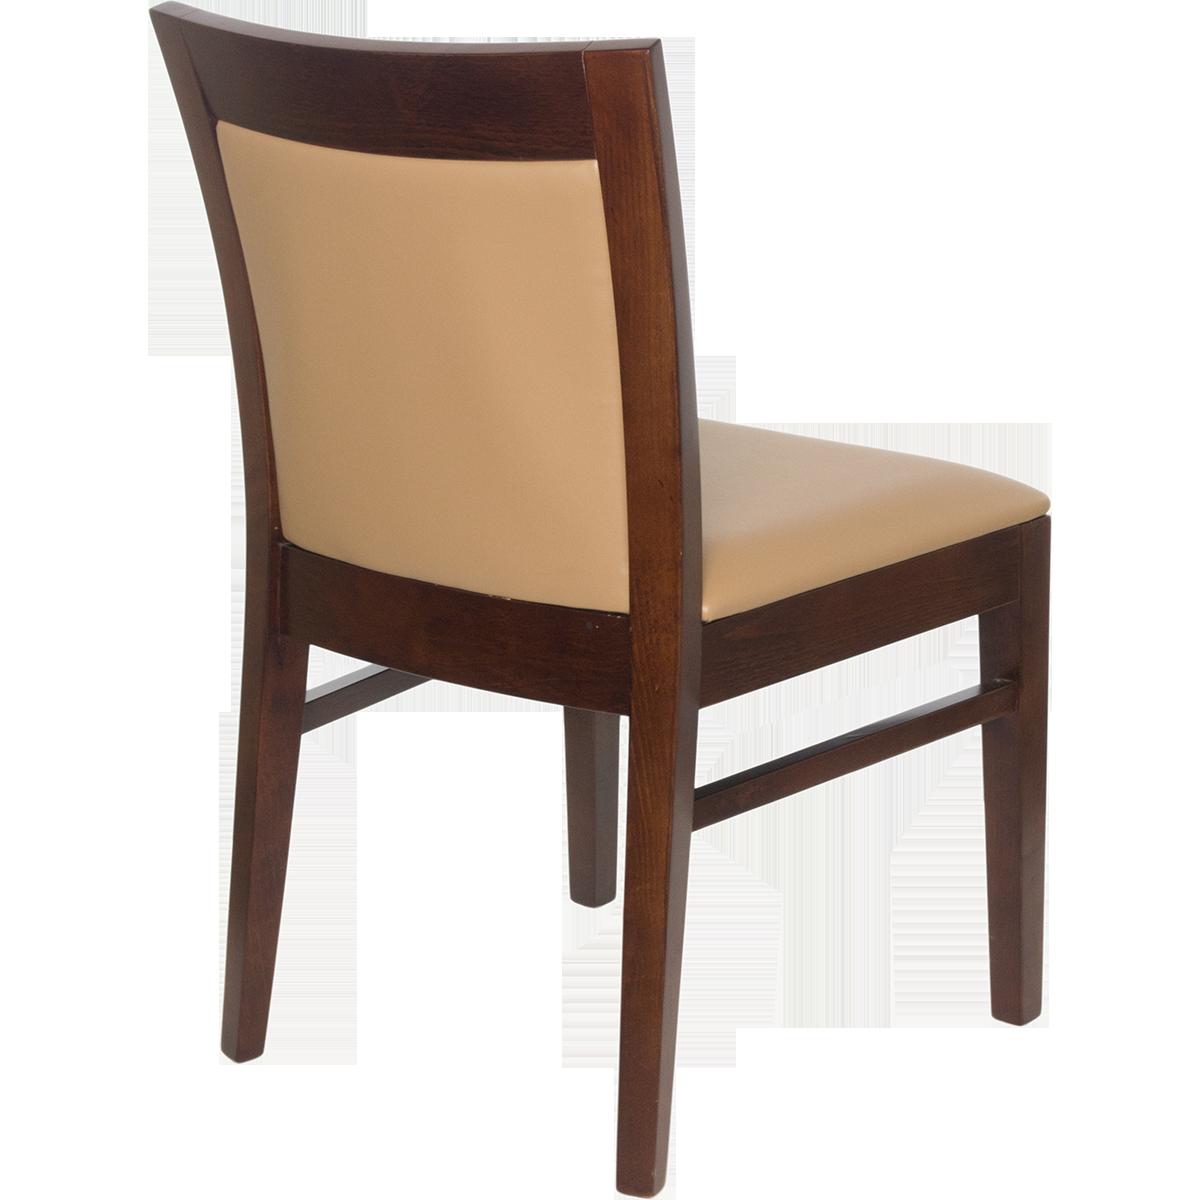 Swivel Sling Patio Chairs Patio Chairs That Swivel